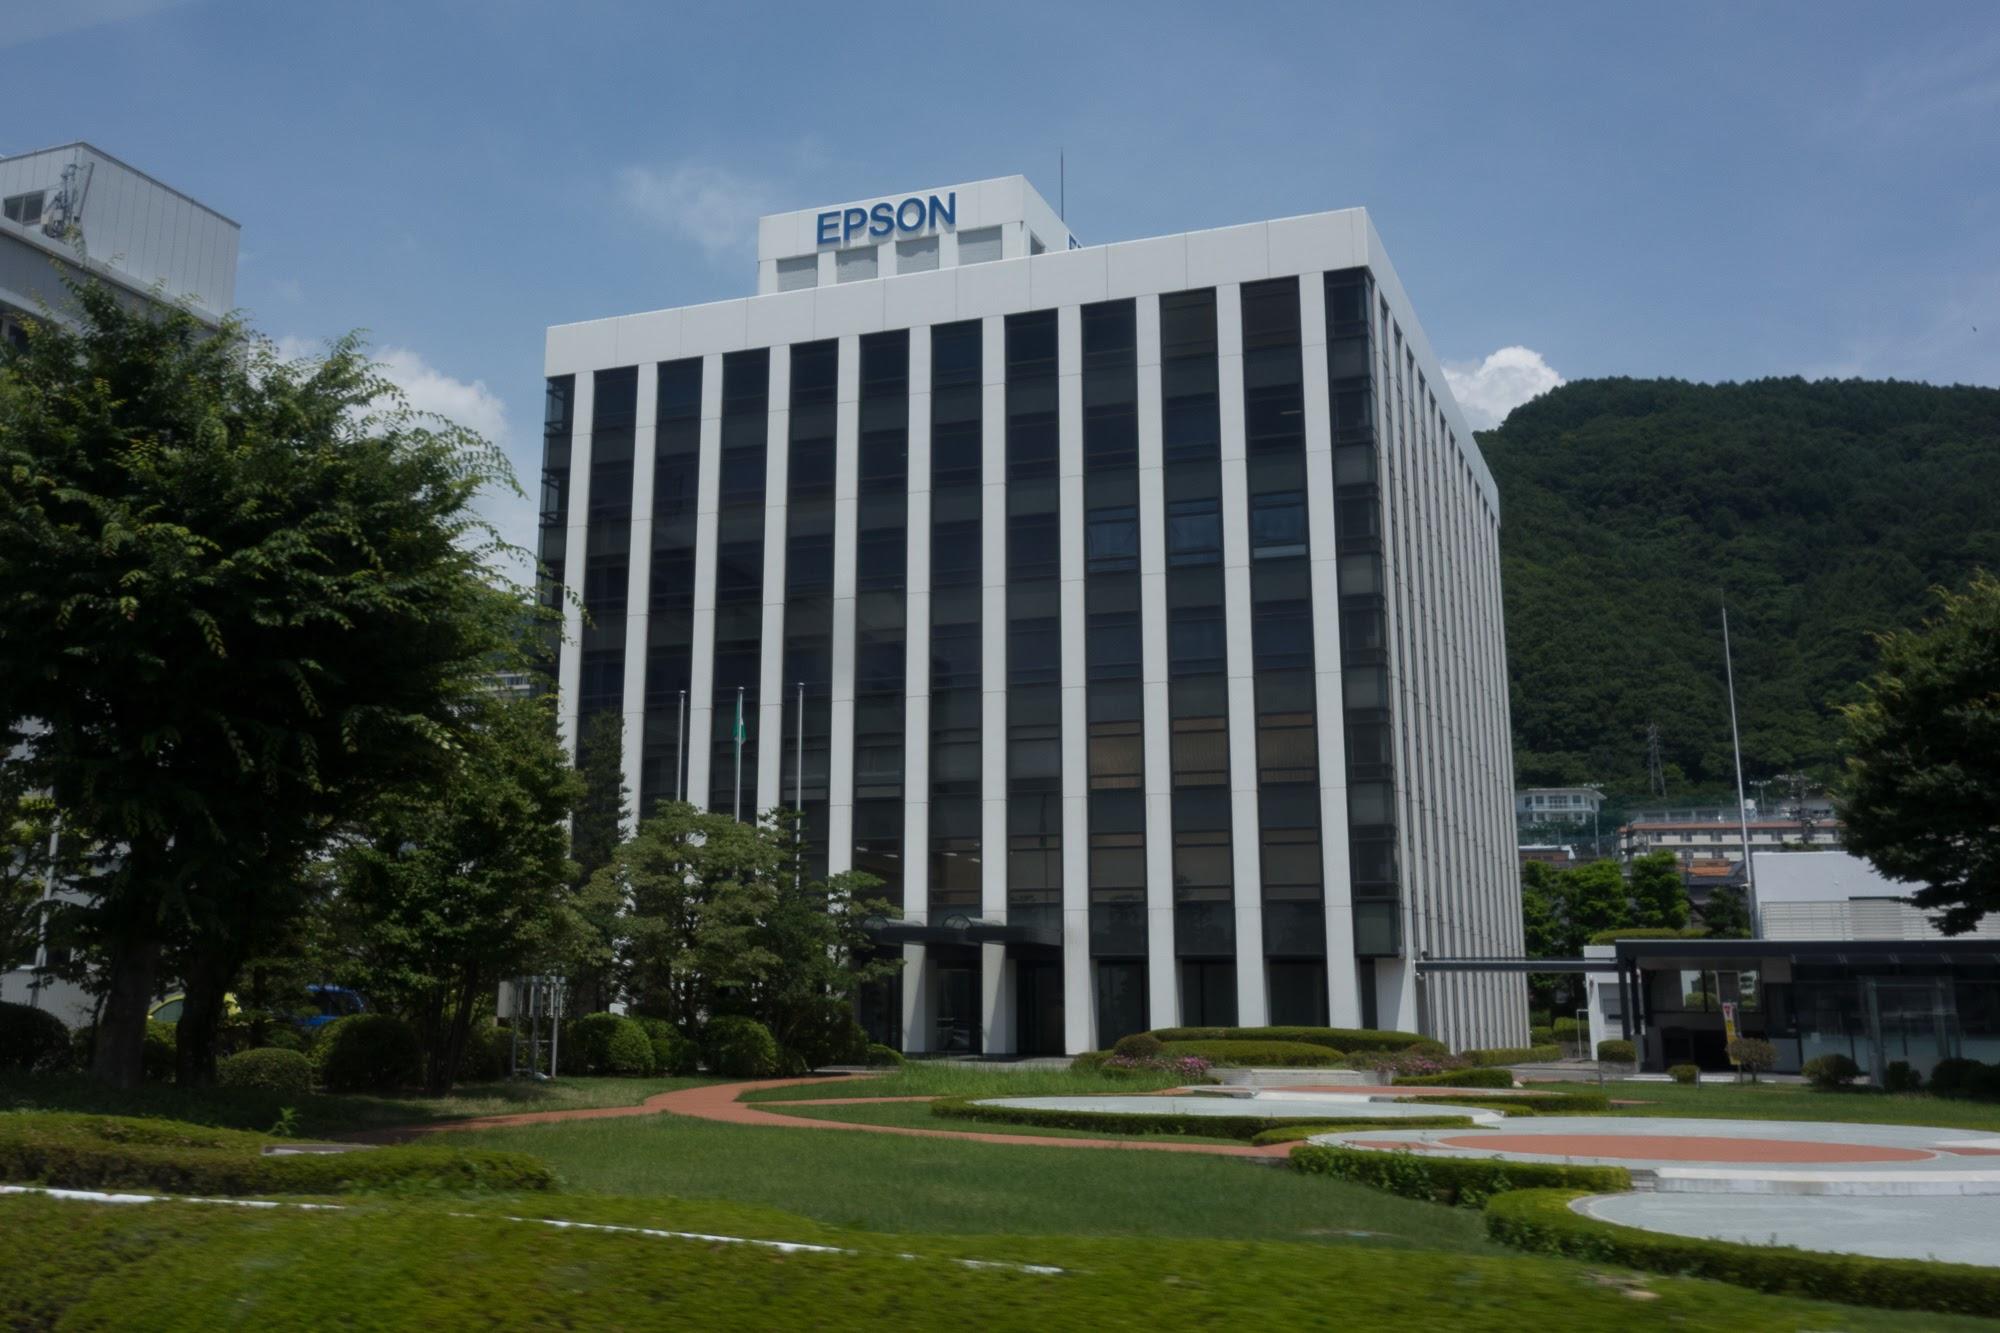 Epson HQ